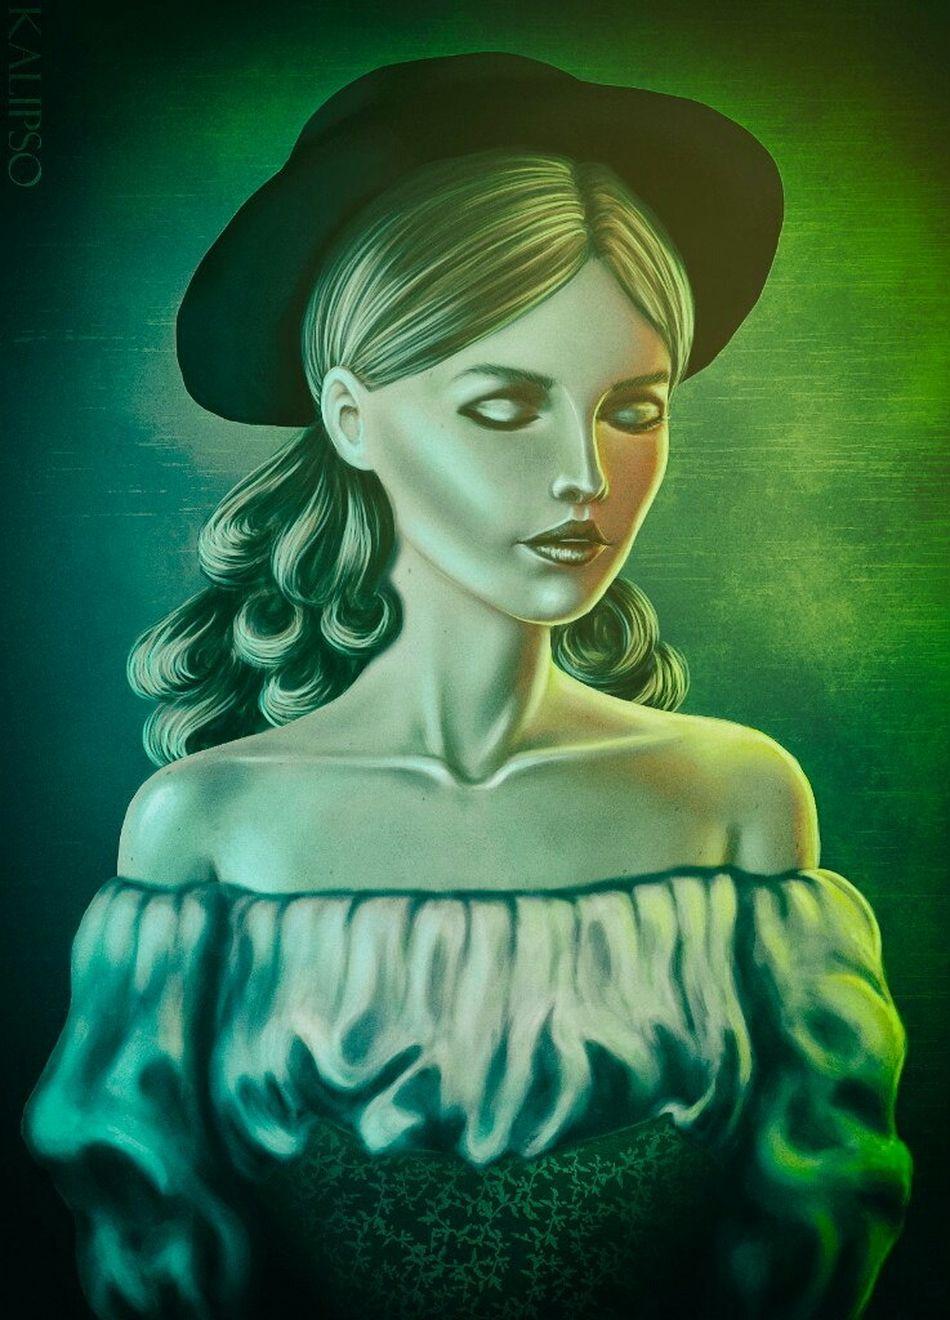 Art Sims Digital Art Photoshop Digital Portrait